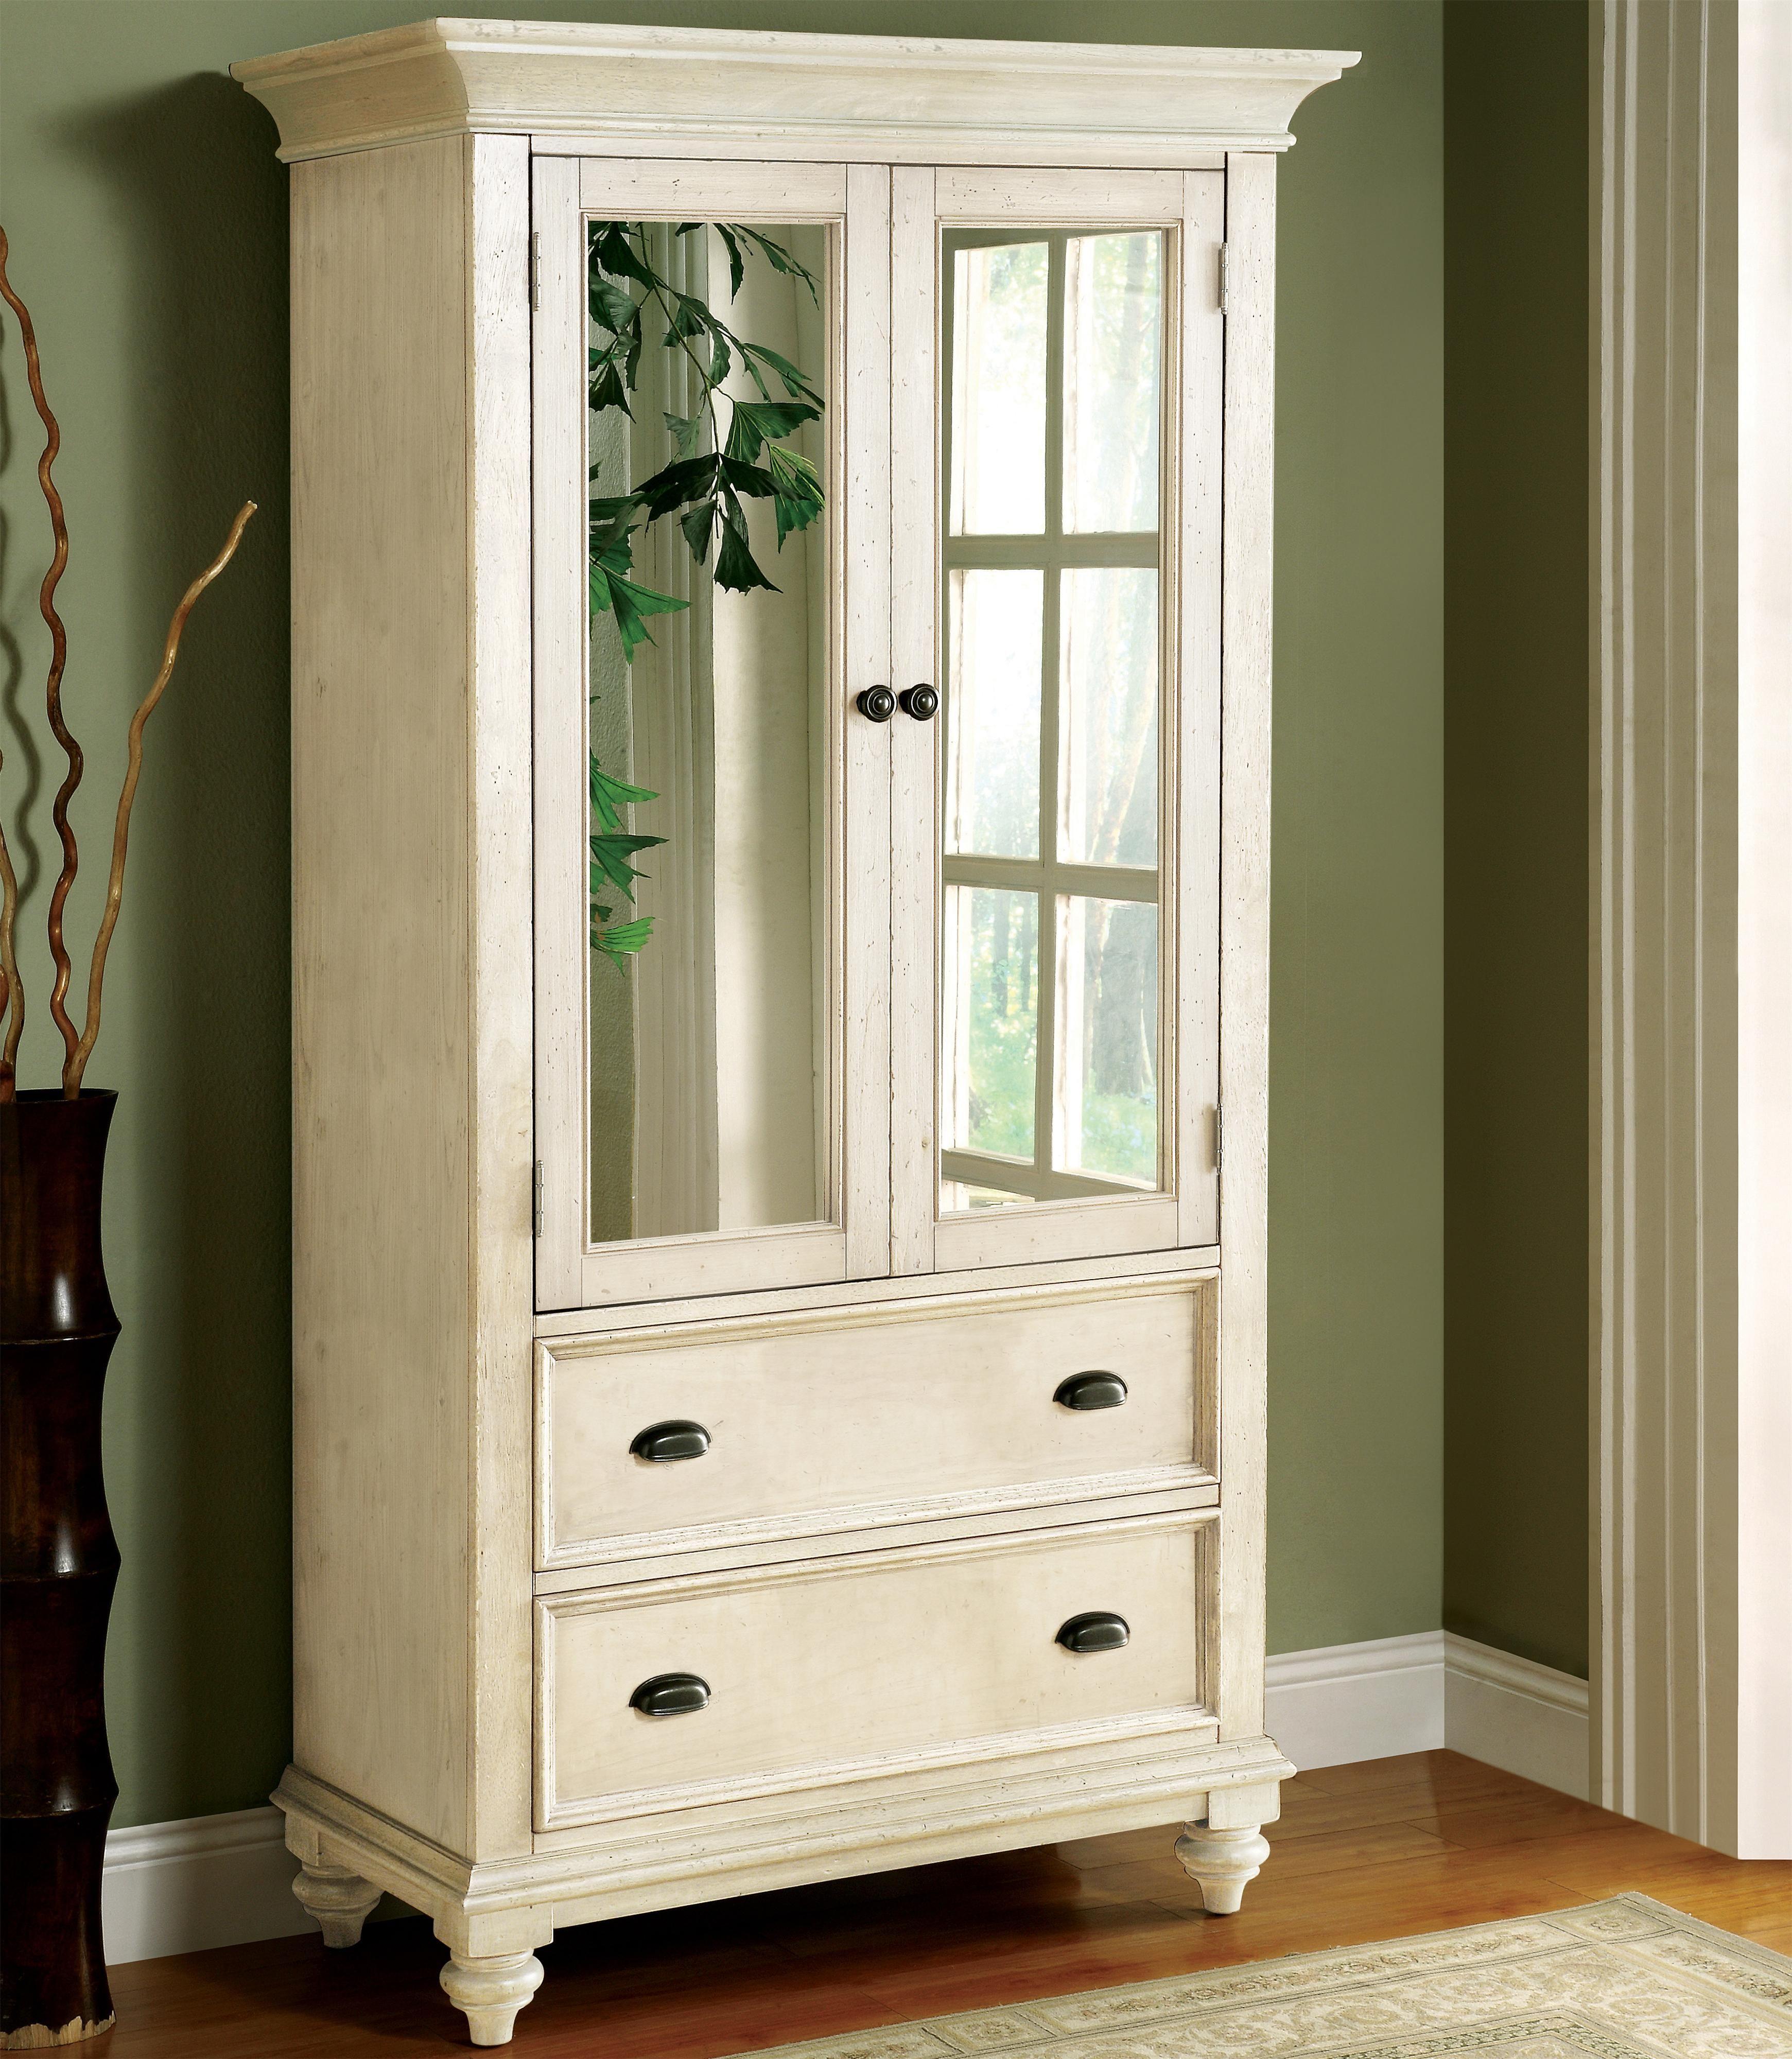 white armoire mirrored master product wardrobe sweetheart cfm door